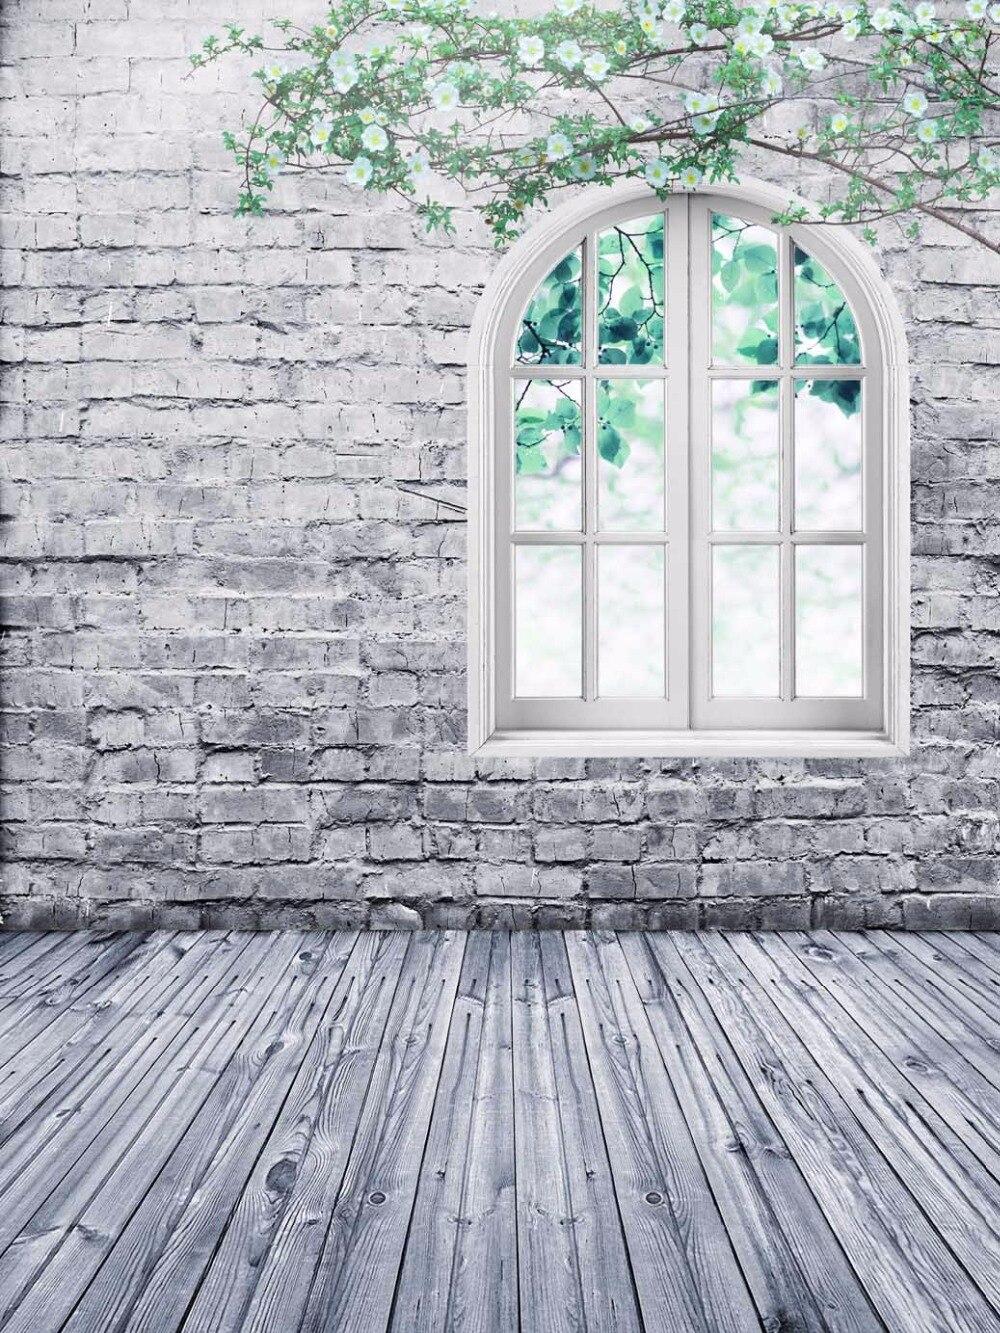 Photo Backdrops 200x300cm White Brick Wall with Wood Floor Wedding Photographic Background Studio Vintage Wedding Photo Booth